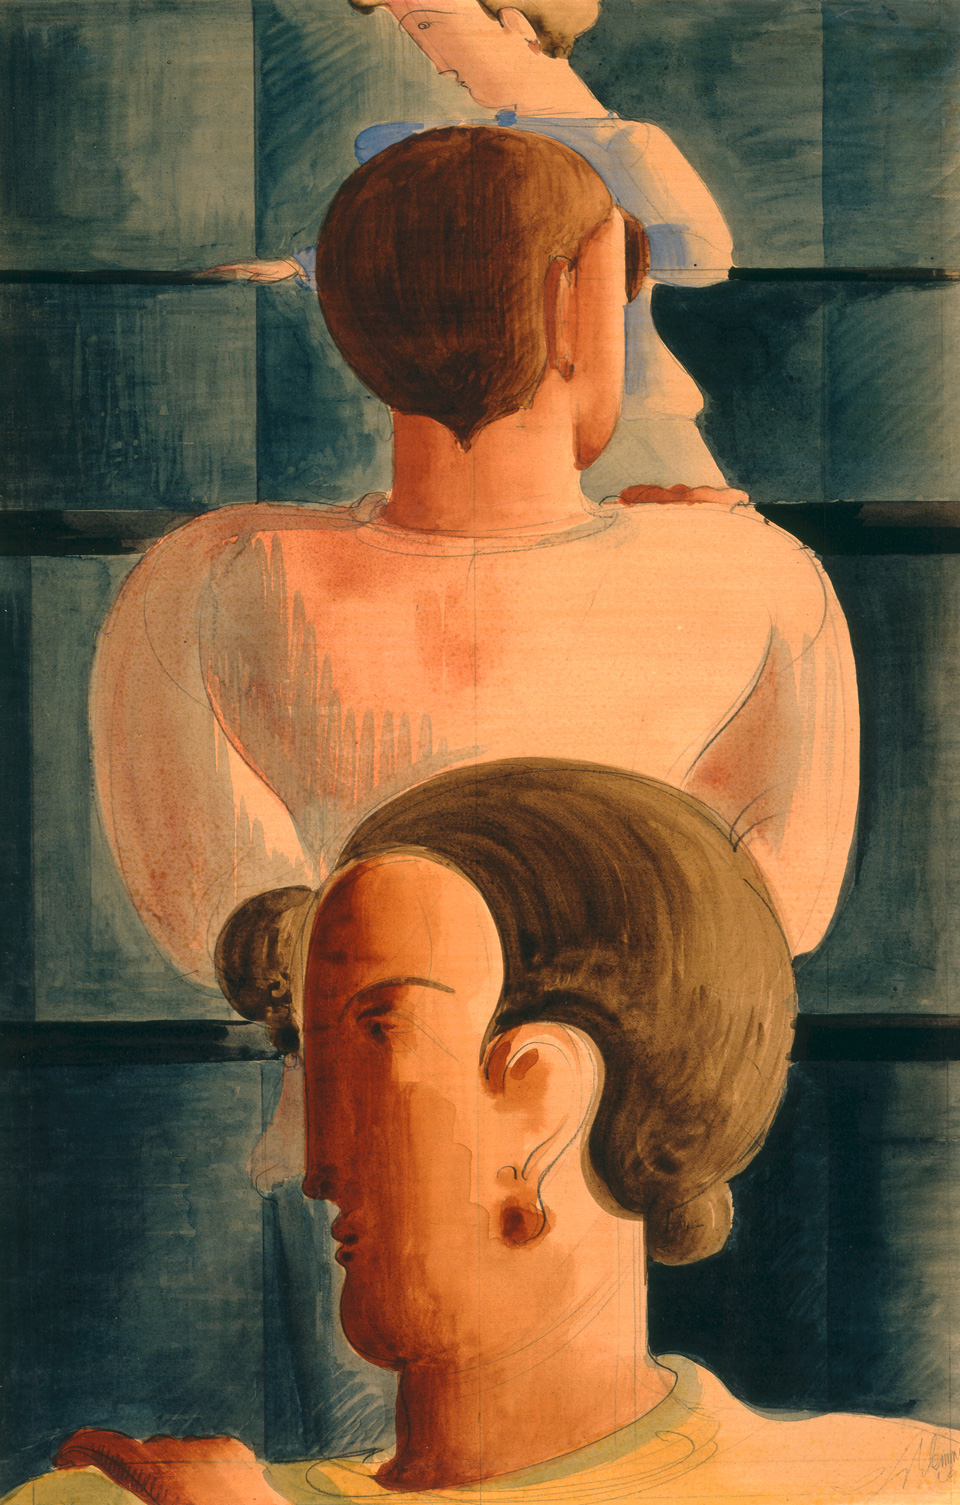 Oskar Schlemmer: Geländer-Szene I, 1931, Aquarell über Bleistift, 54 x 36 cm, Albertina, Wien, Sammlung Forberg, Foto: Peter Schälchli, Zürich - Inv. DL320